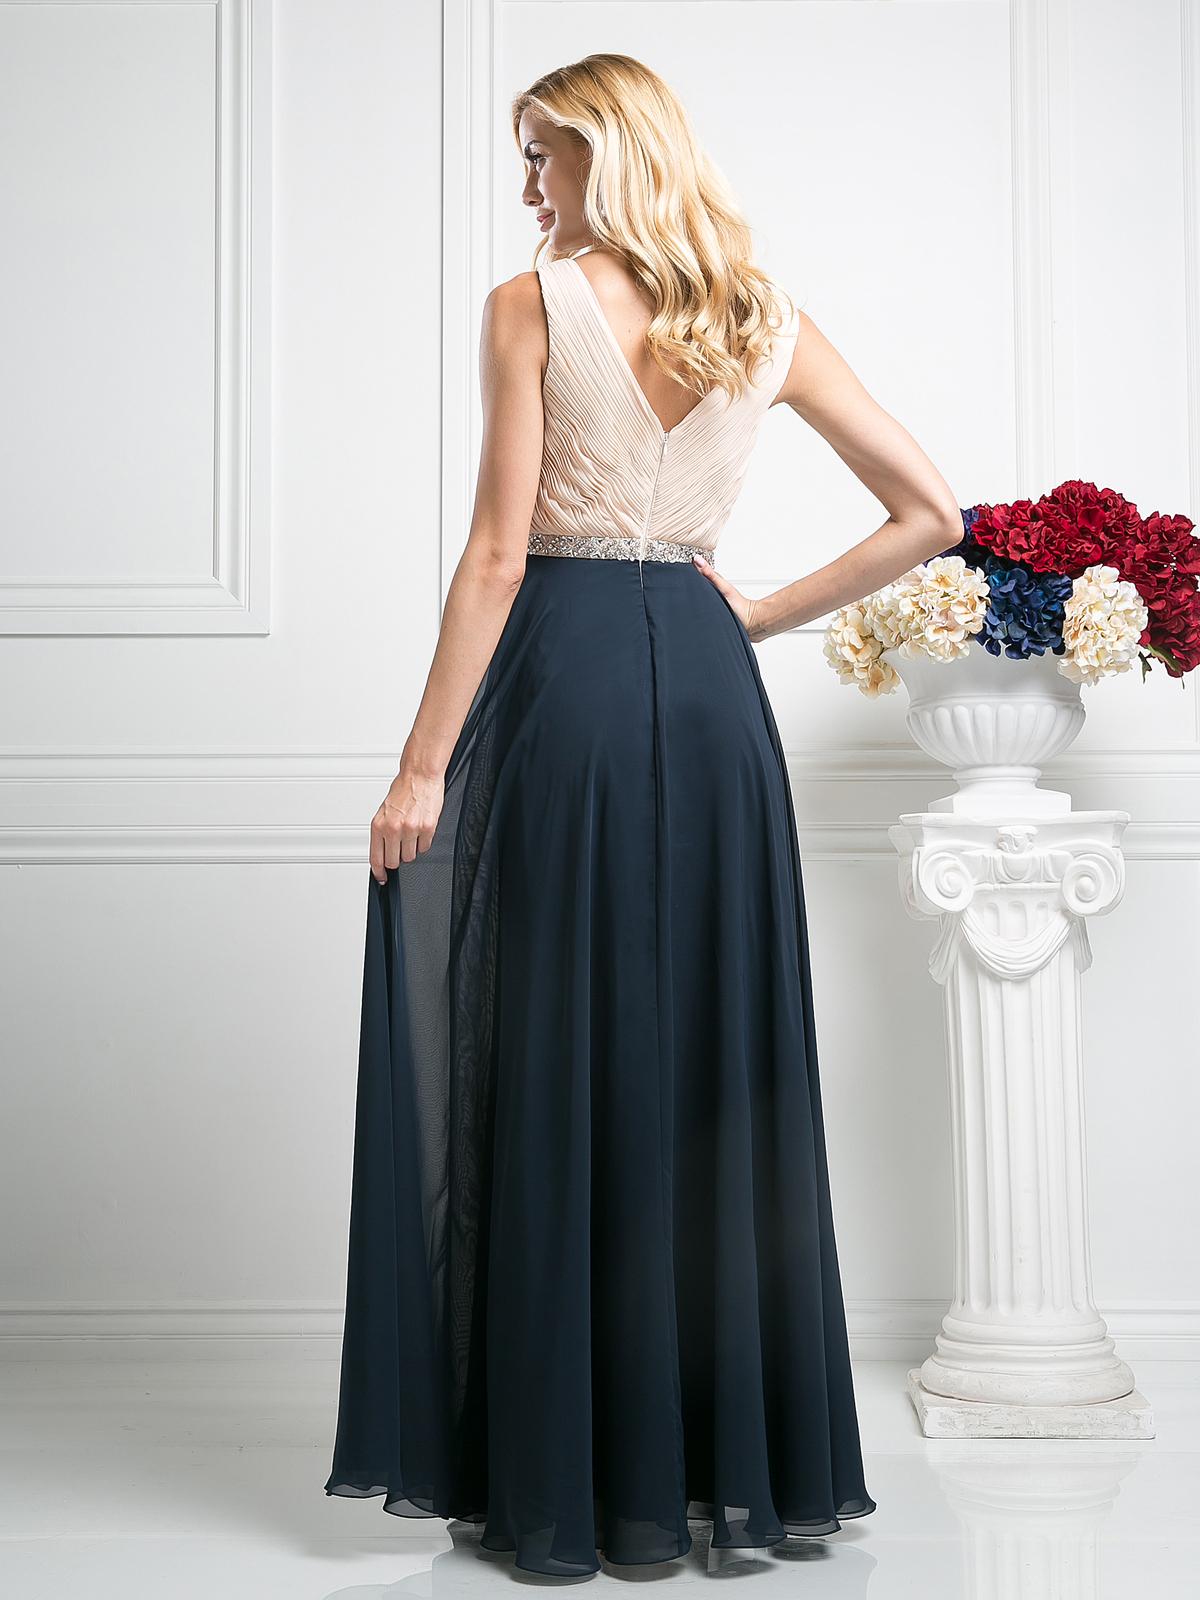 Sleeveless V Neck Bridesmaid Dress Sung Boutique L A